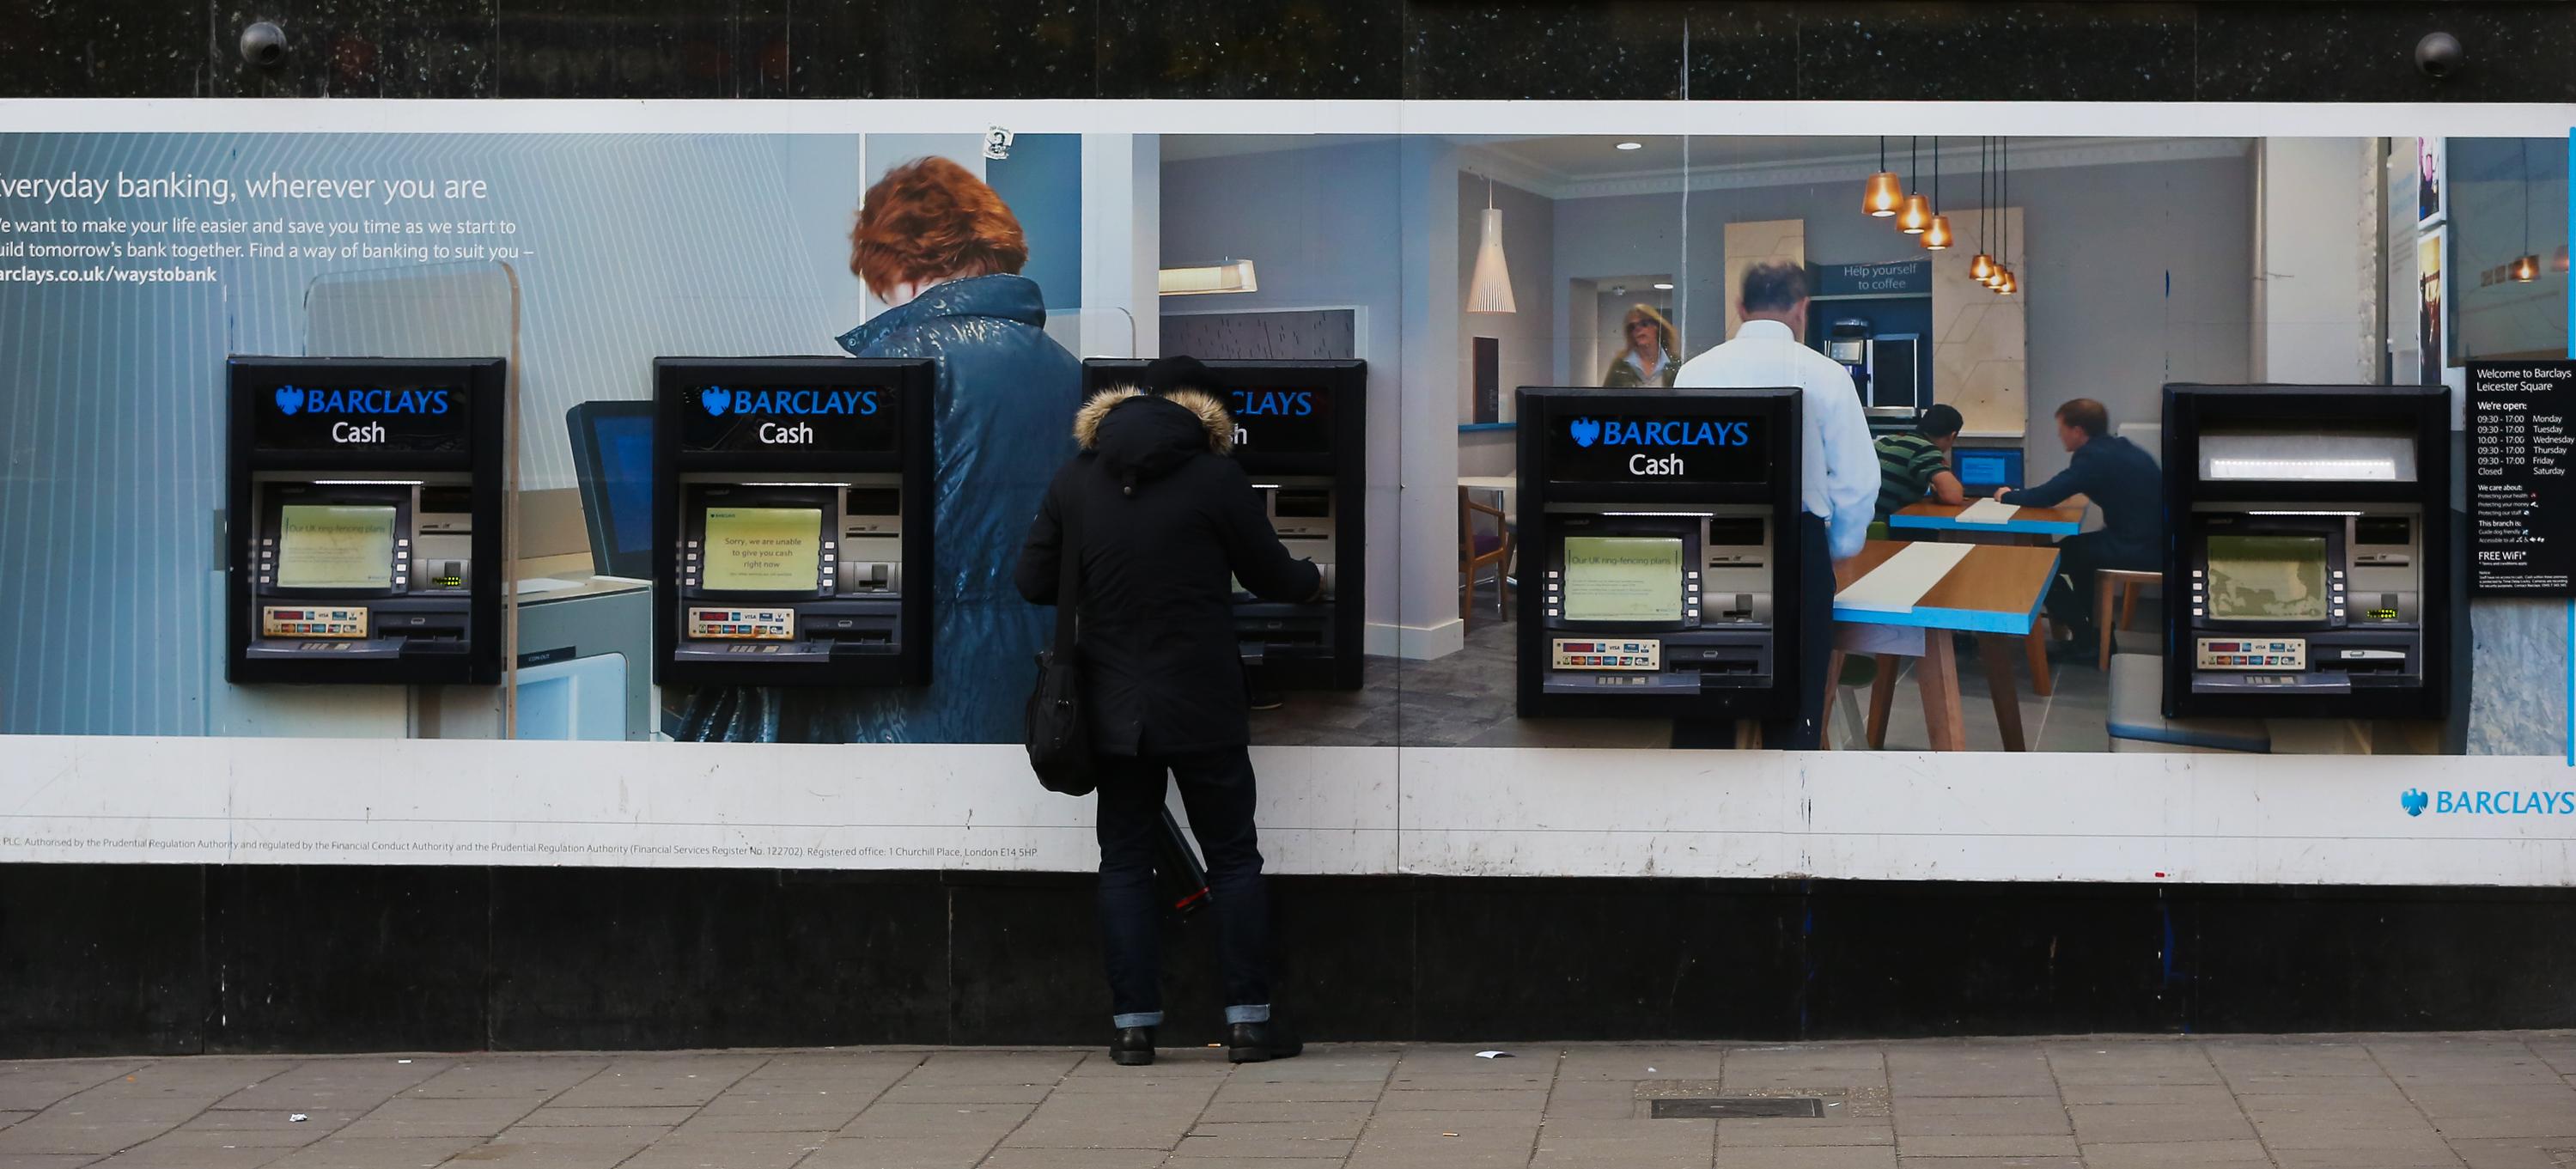 Barclays cashpoint machines